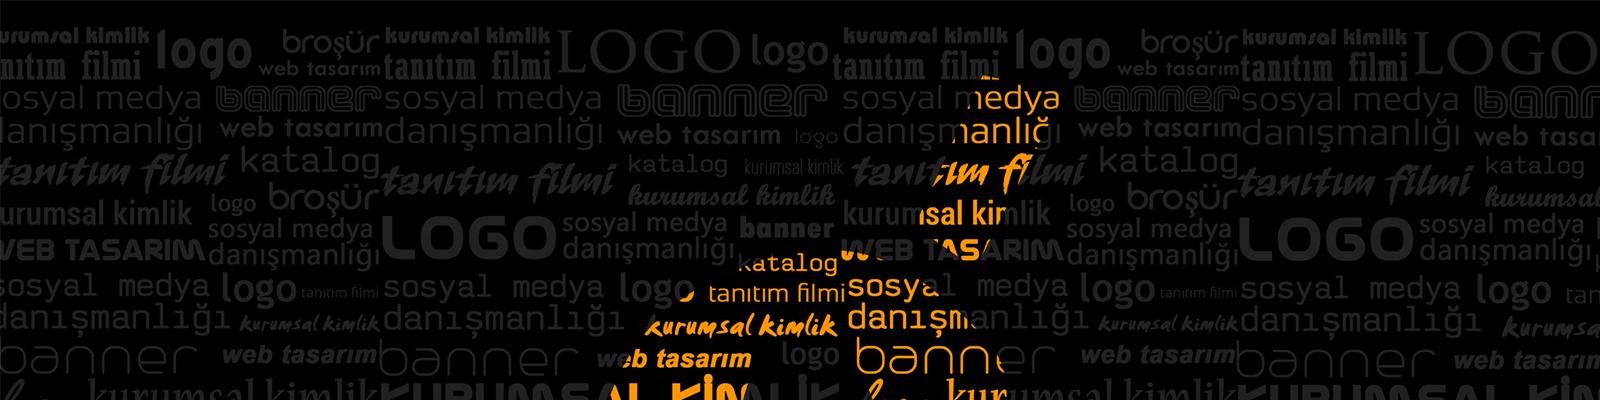 Bilimon Reklam ve Medya banner fotograf